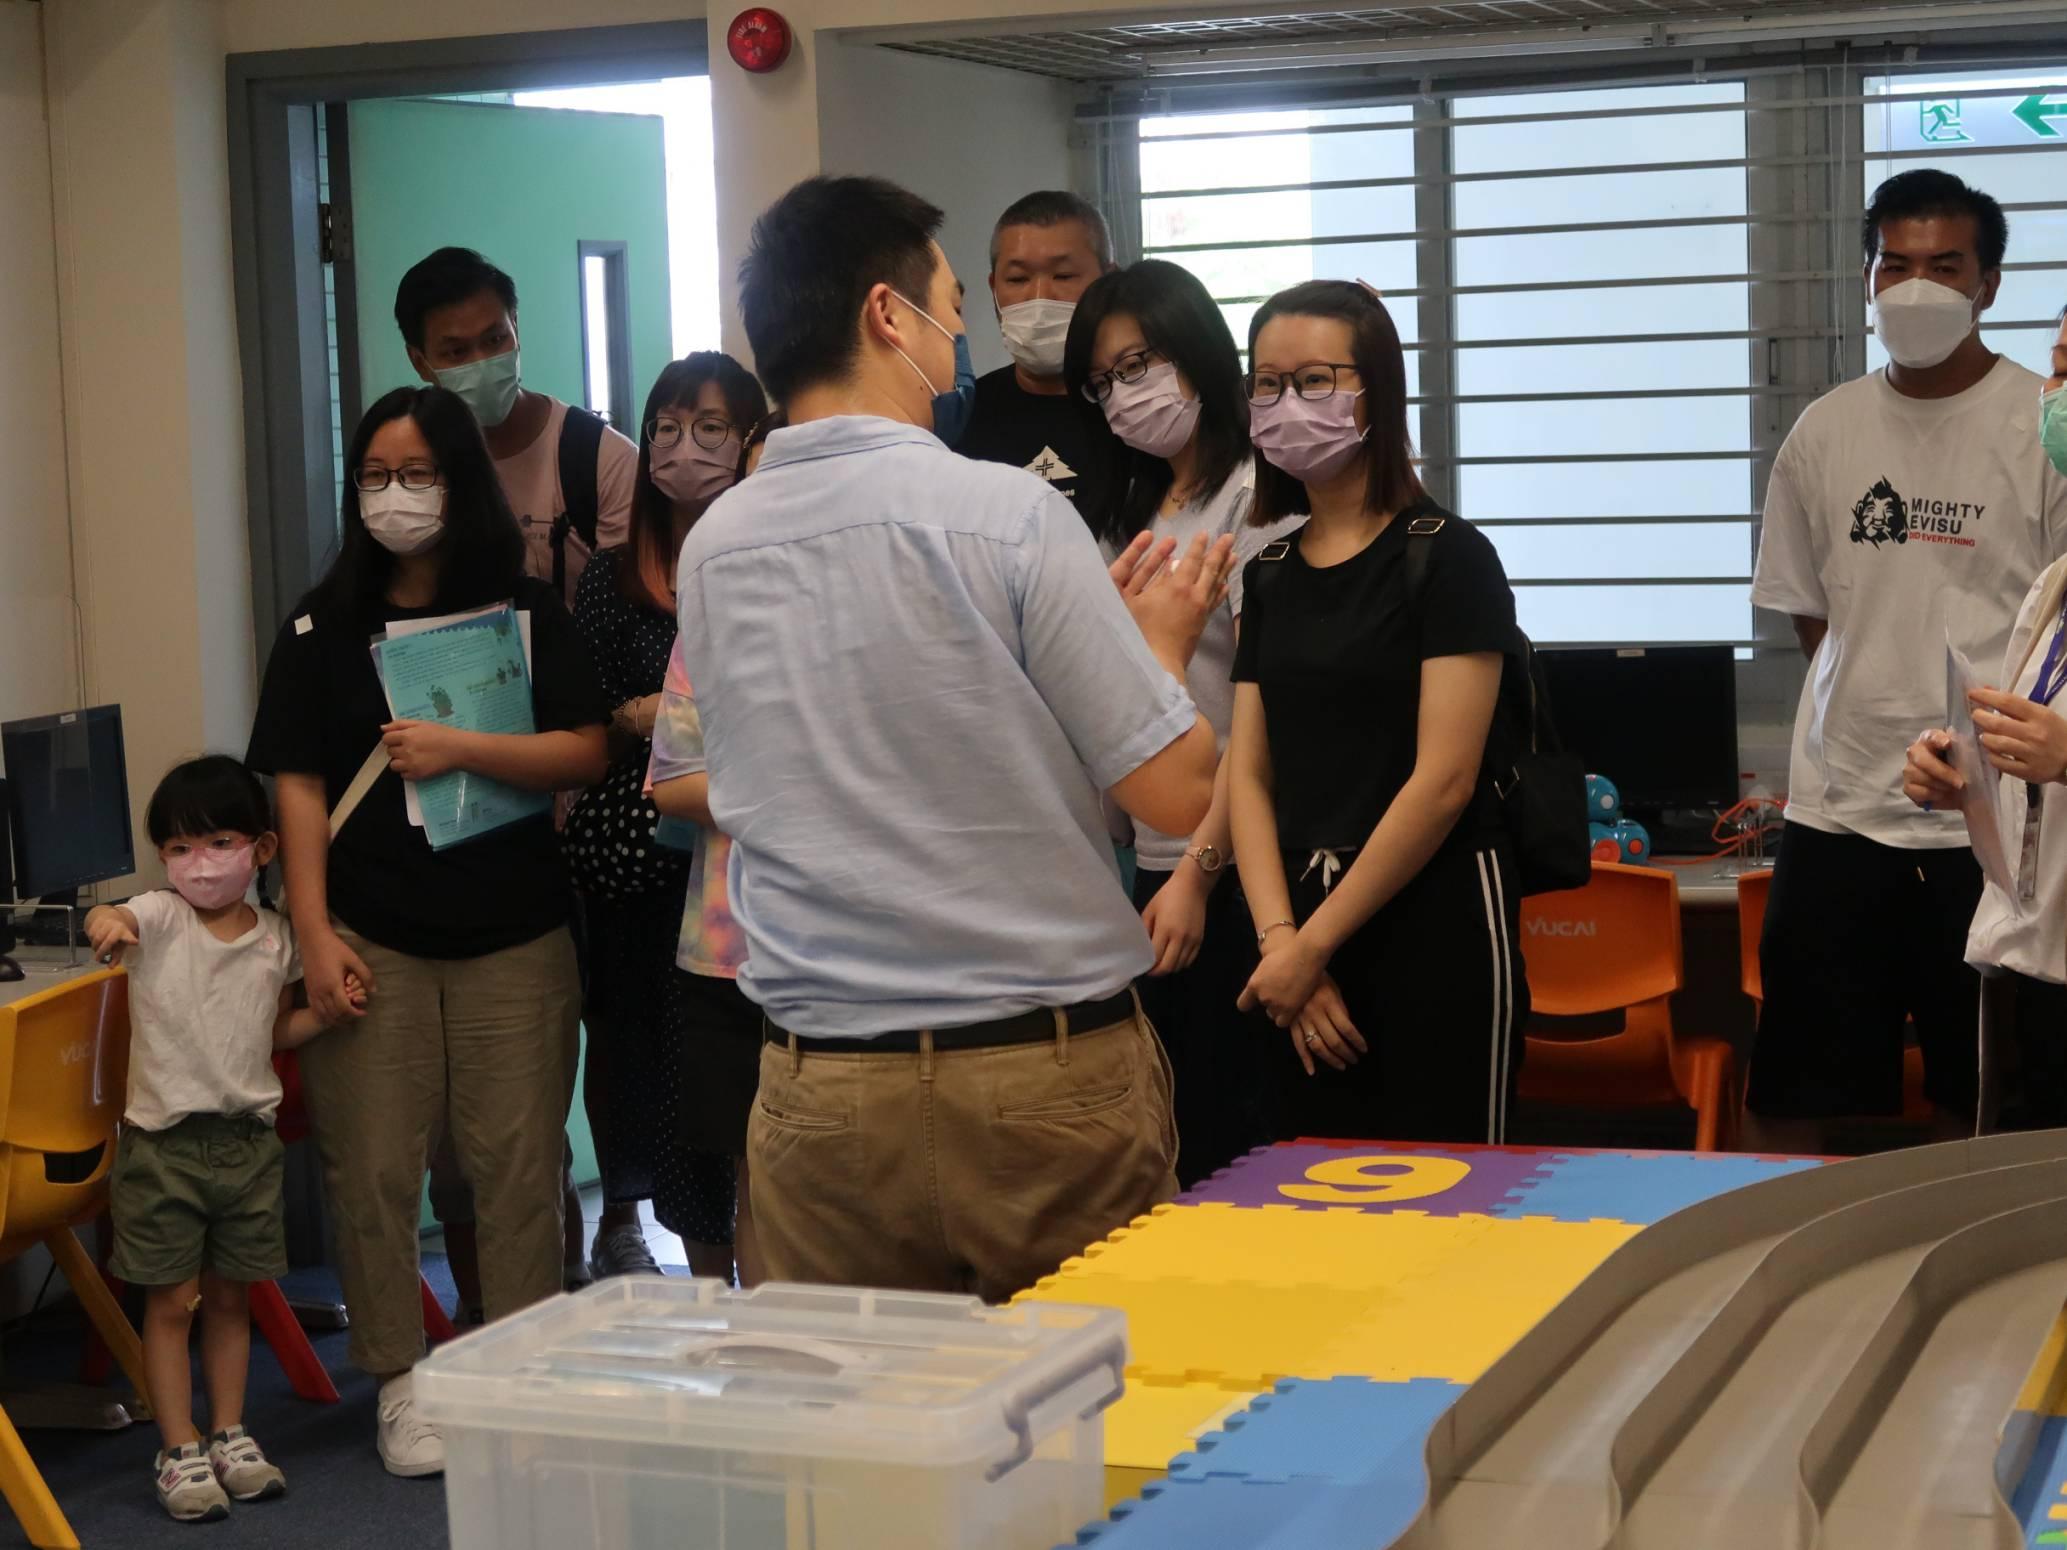 https://syh.edu.hk/sites/default/files/img_7415.jpg